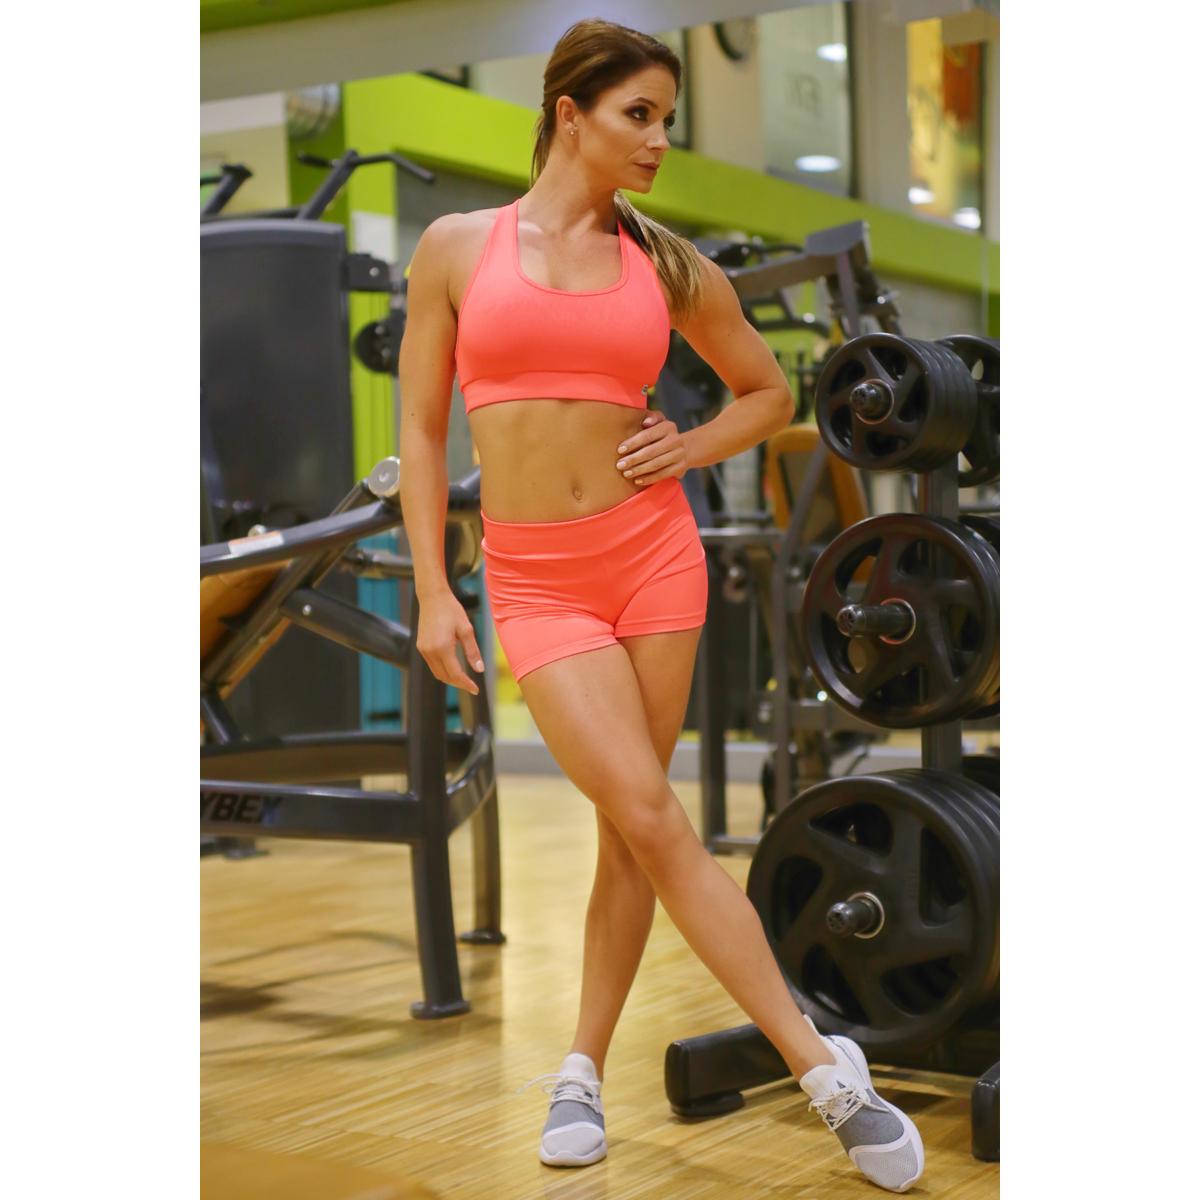 Neon korall (rio) basic női fitness sport short + top szett